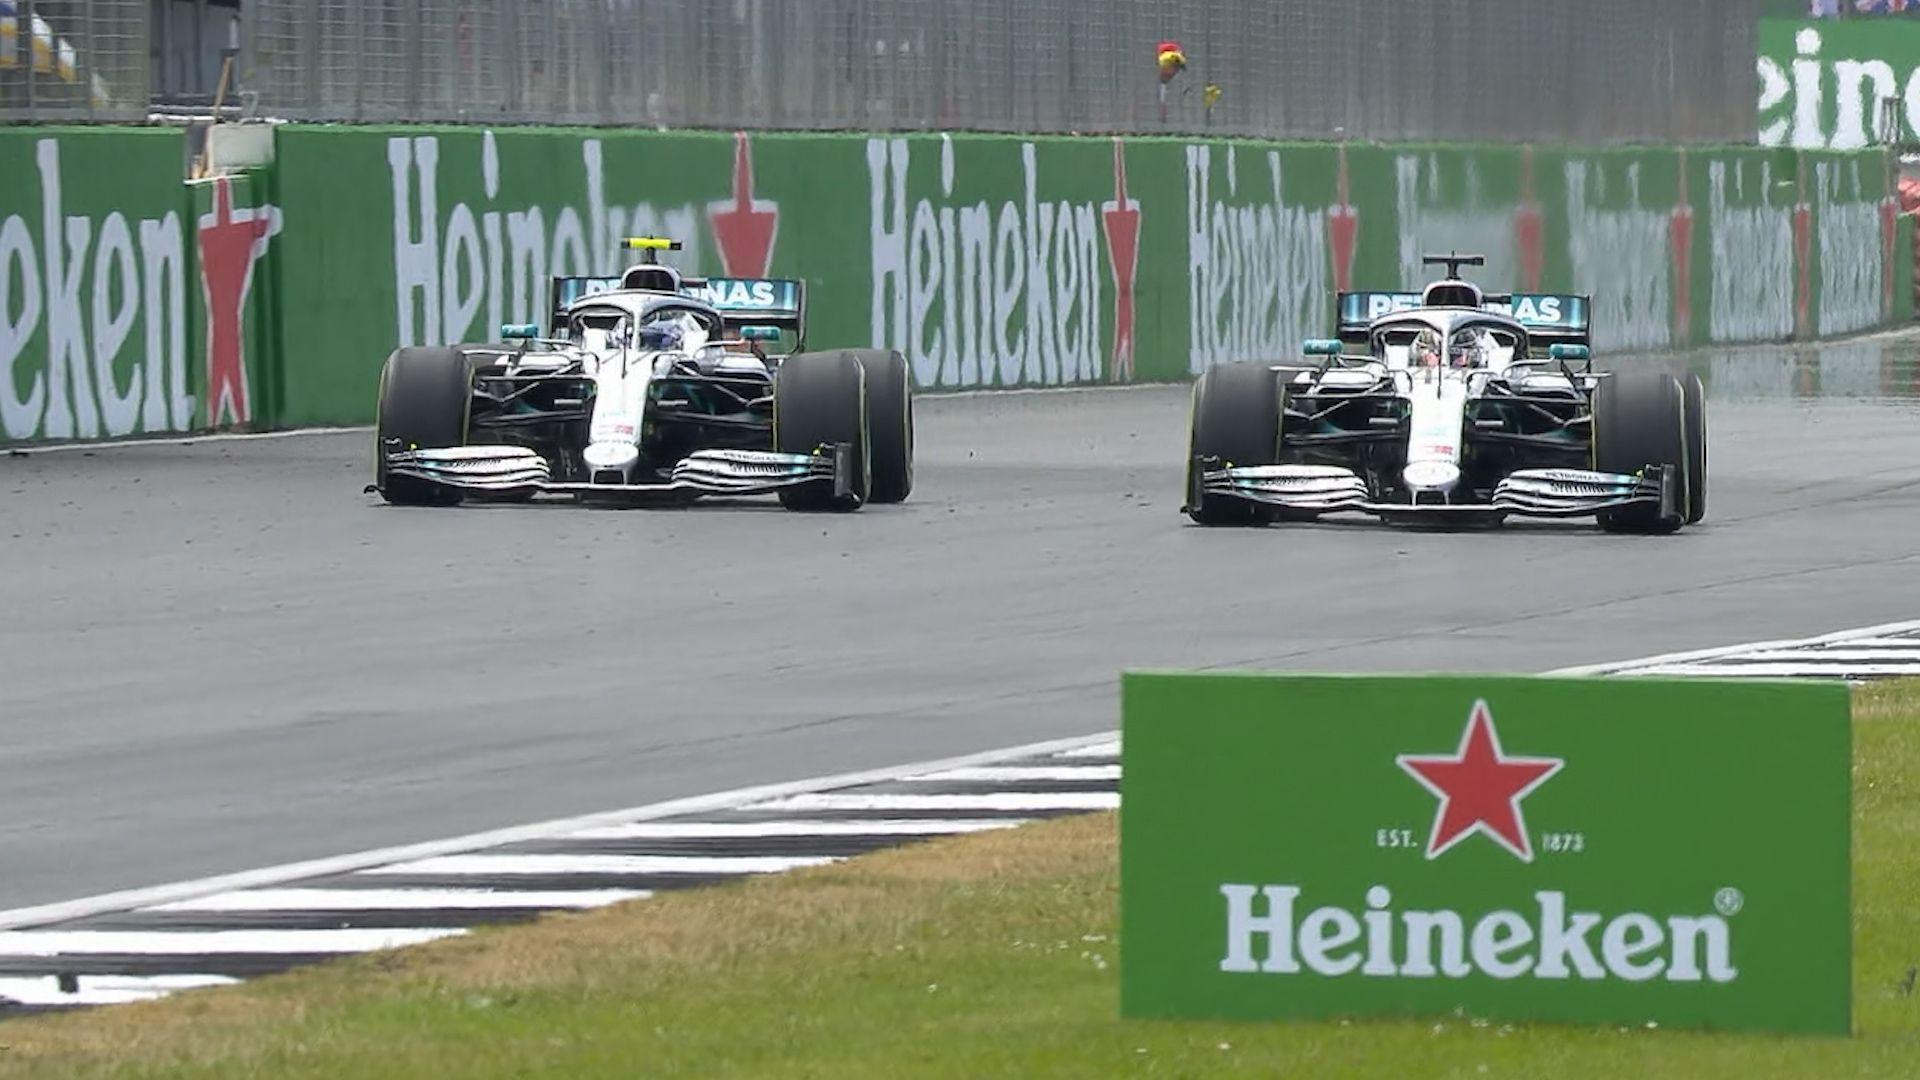 Strategy error cost me victory shot, says Bottas | Formula 1®